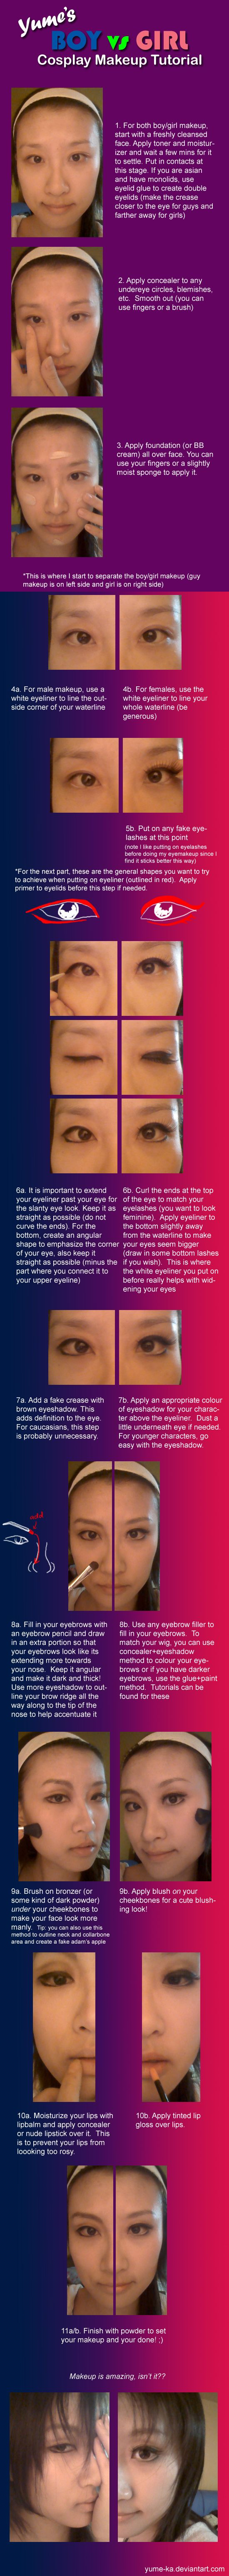 Boy vs Girl Cosplay Makeup Tutorial by Yume-ka on DeviantArt